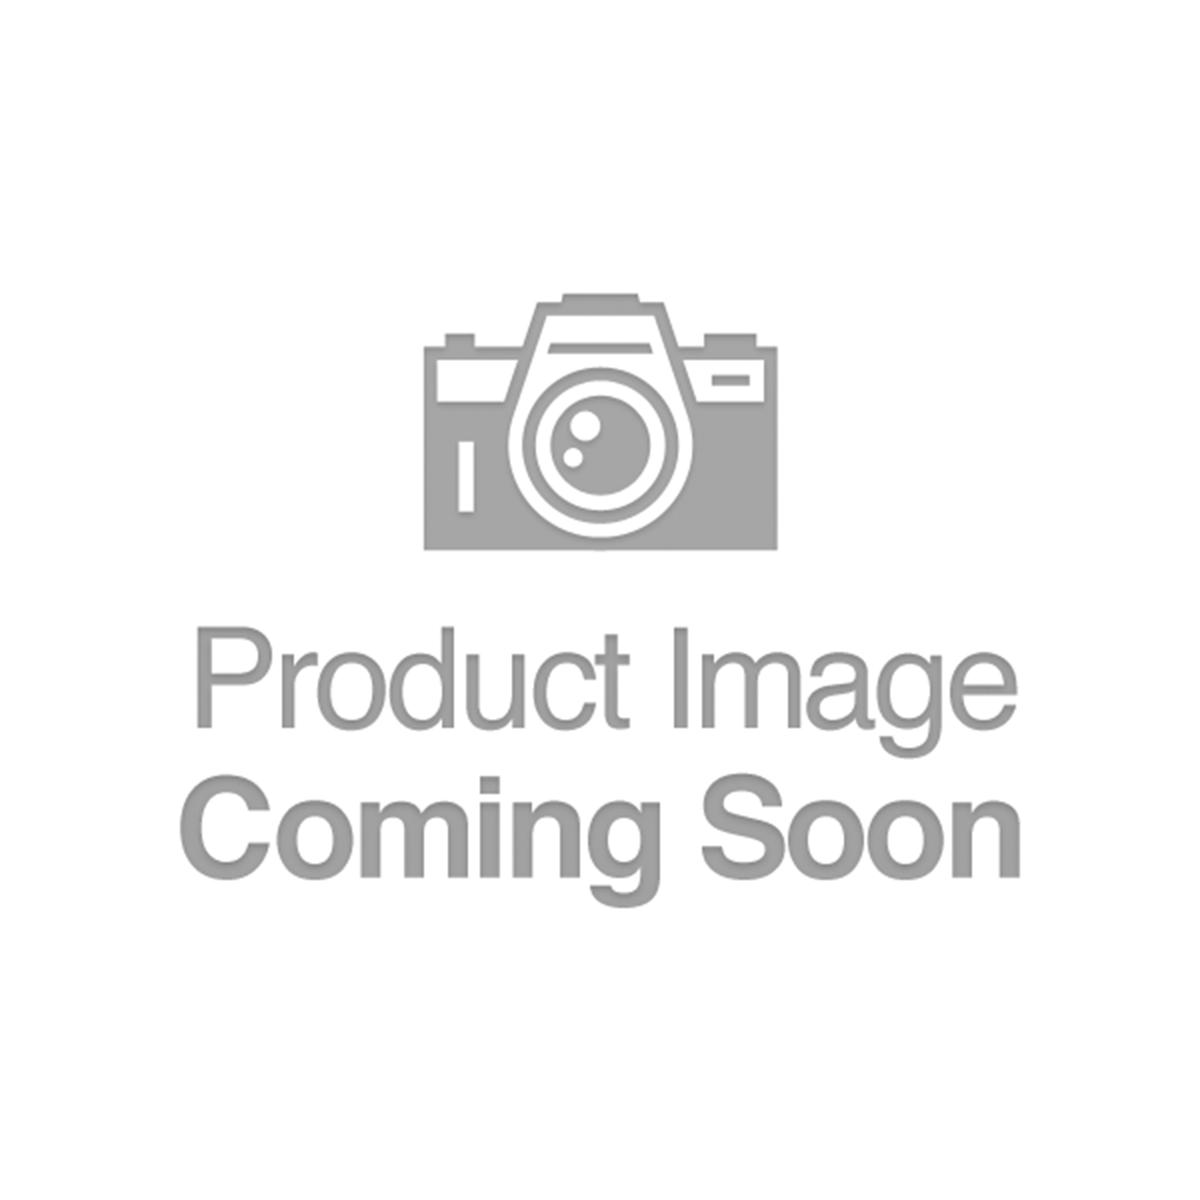 Rare C Bechtler 28G High G$1 NGC MS61 CAC